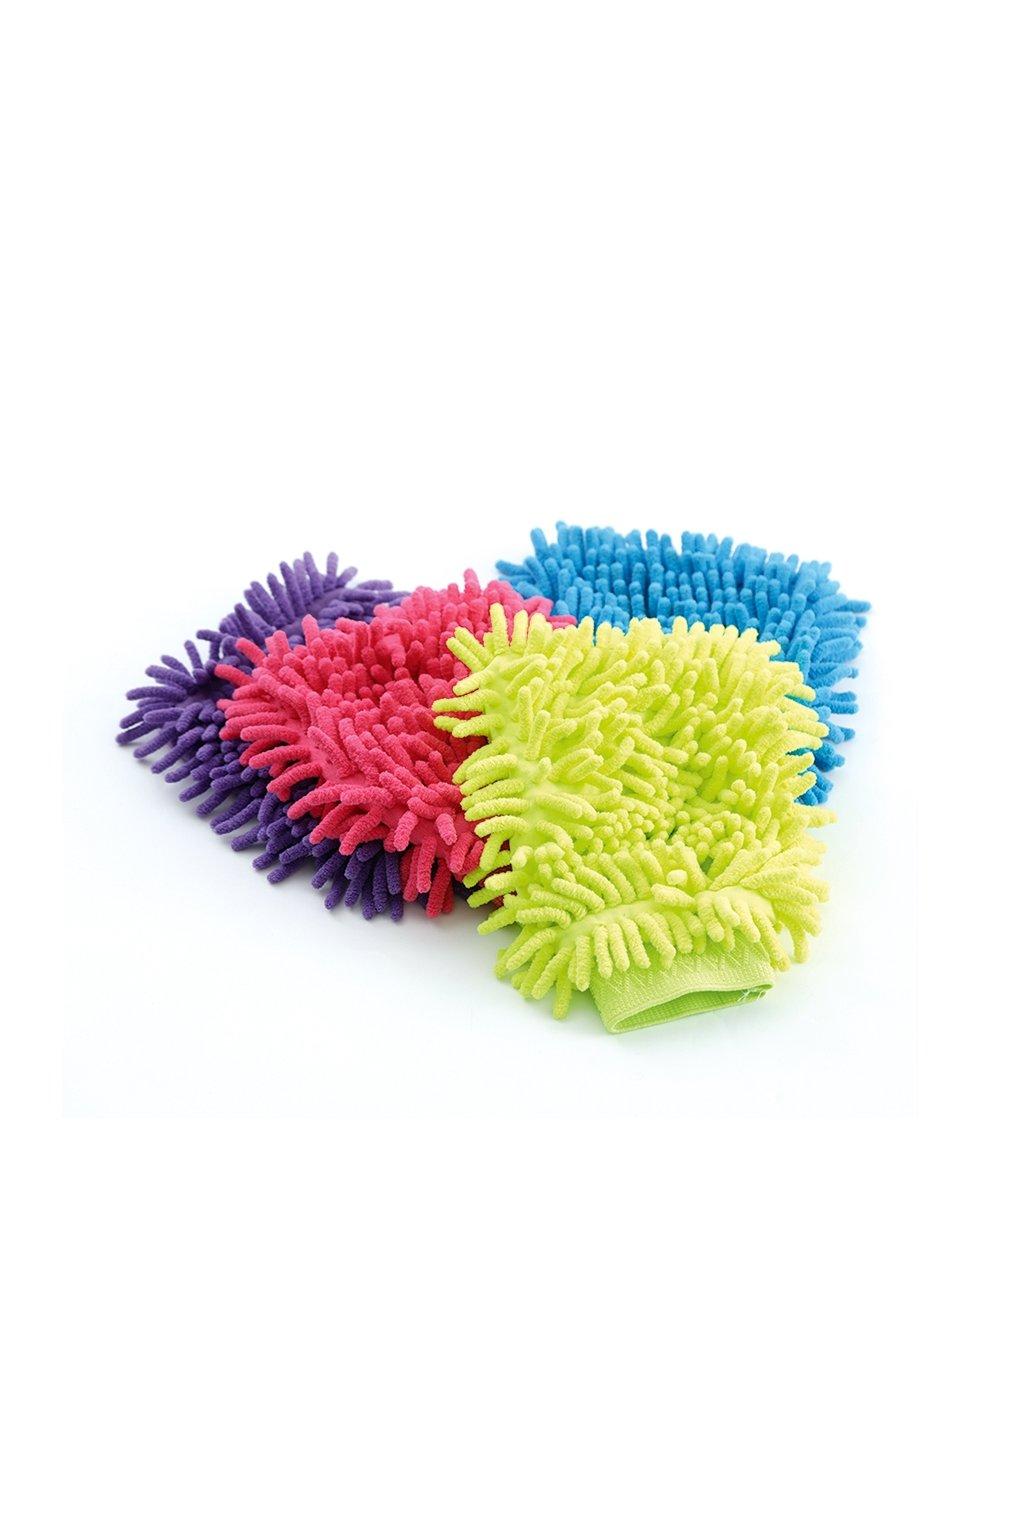 40 Microfibre Grooming Mitt Webx900